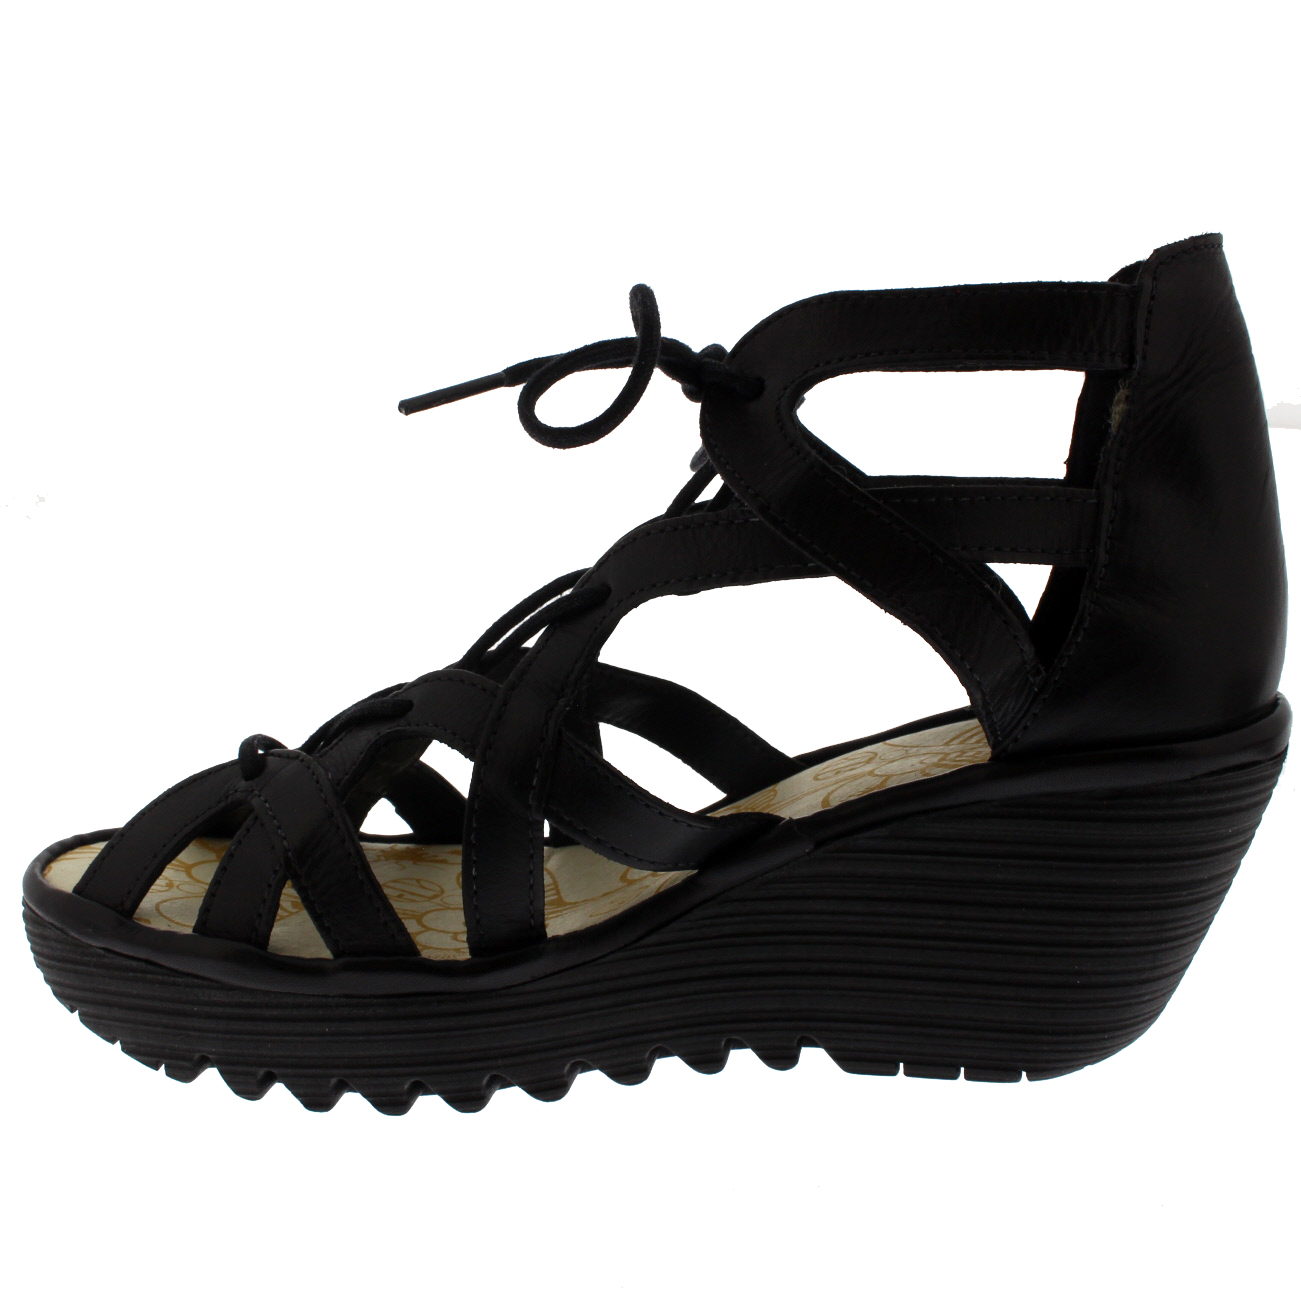 Damenschuhe Fly London Yeli Summer Colmar Leder Leder Colmar Wedges Cut Out Schuhes Sandale US 5-12 a2edaf